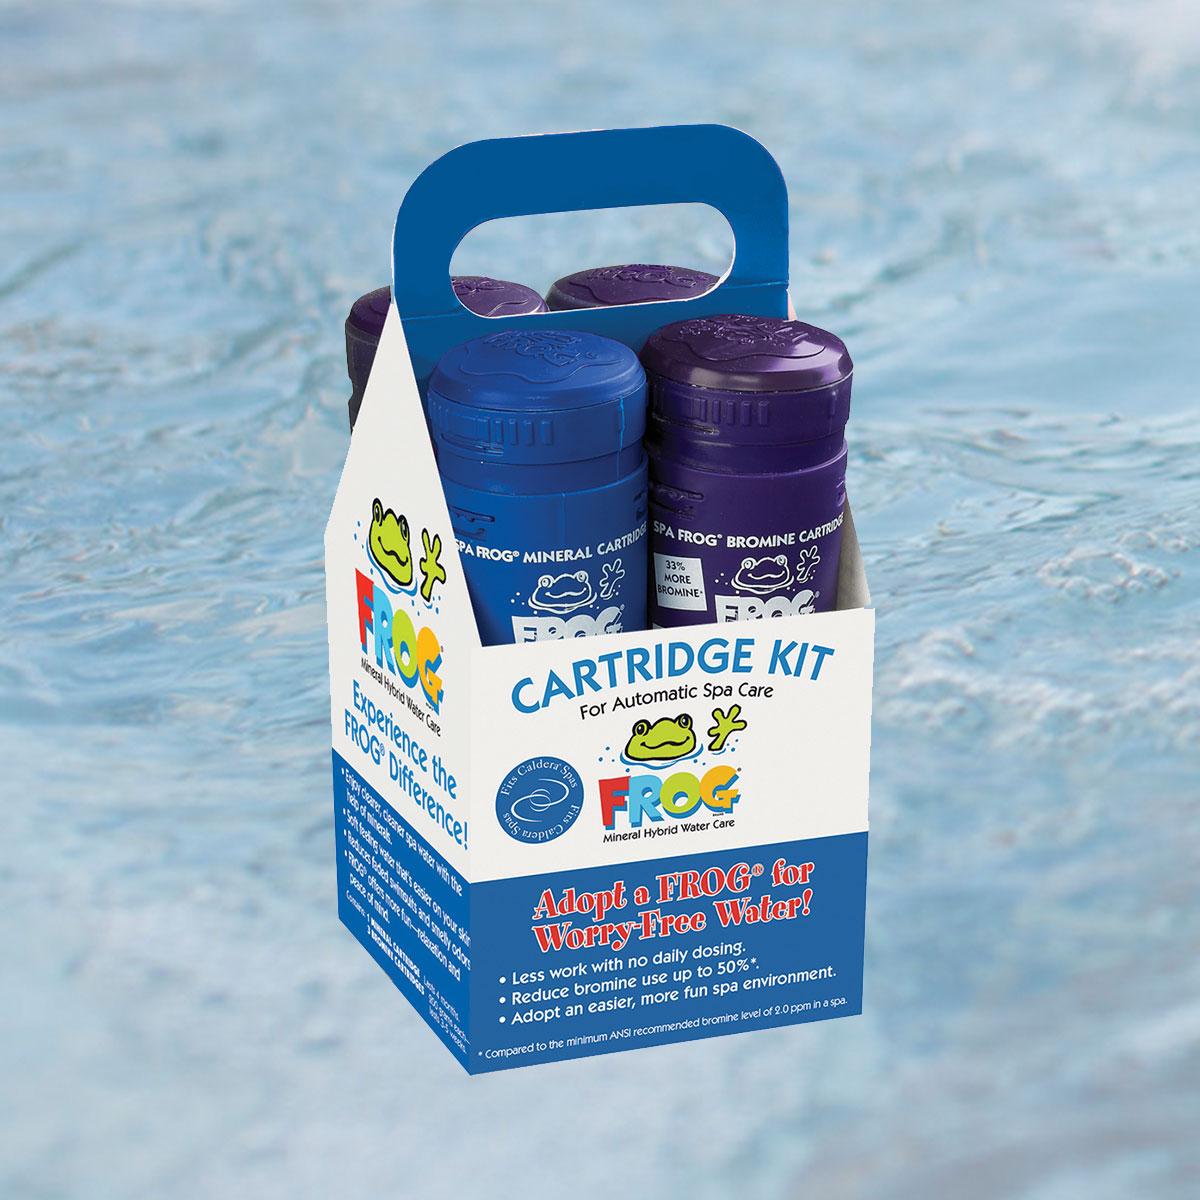 Spa Frog 174 Cartridge Kit The Hot Tub Store